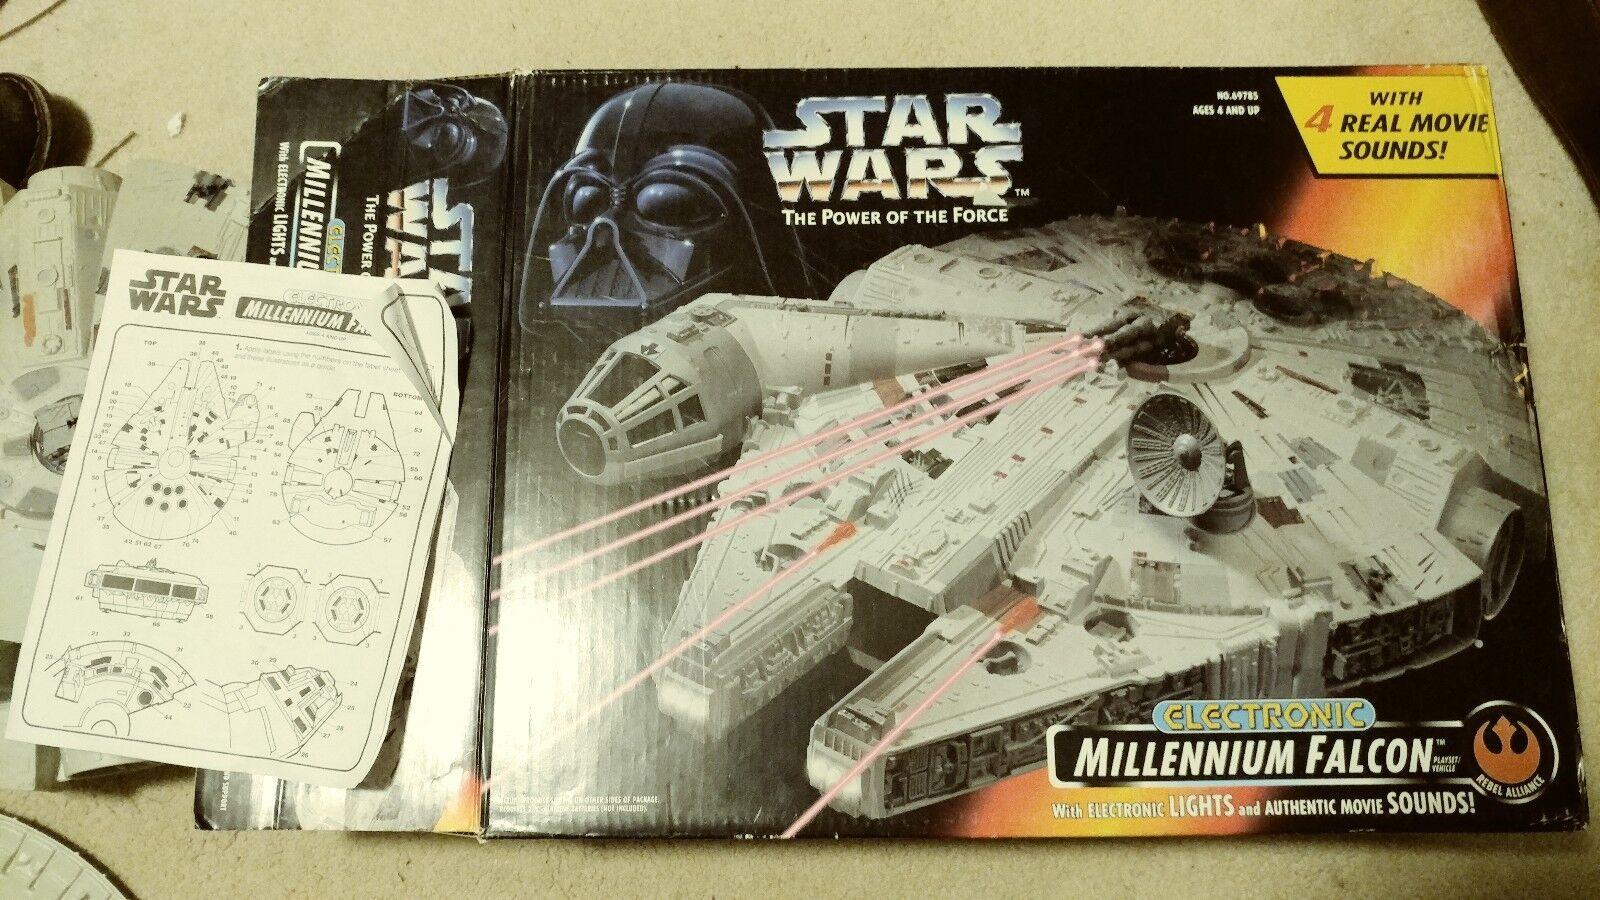 Star Wars Original 1995 Electronic Millennium Falcon